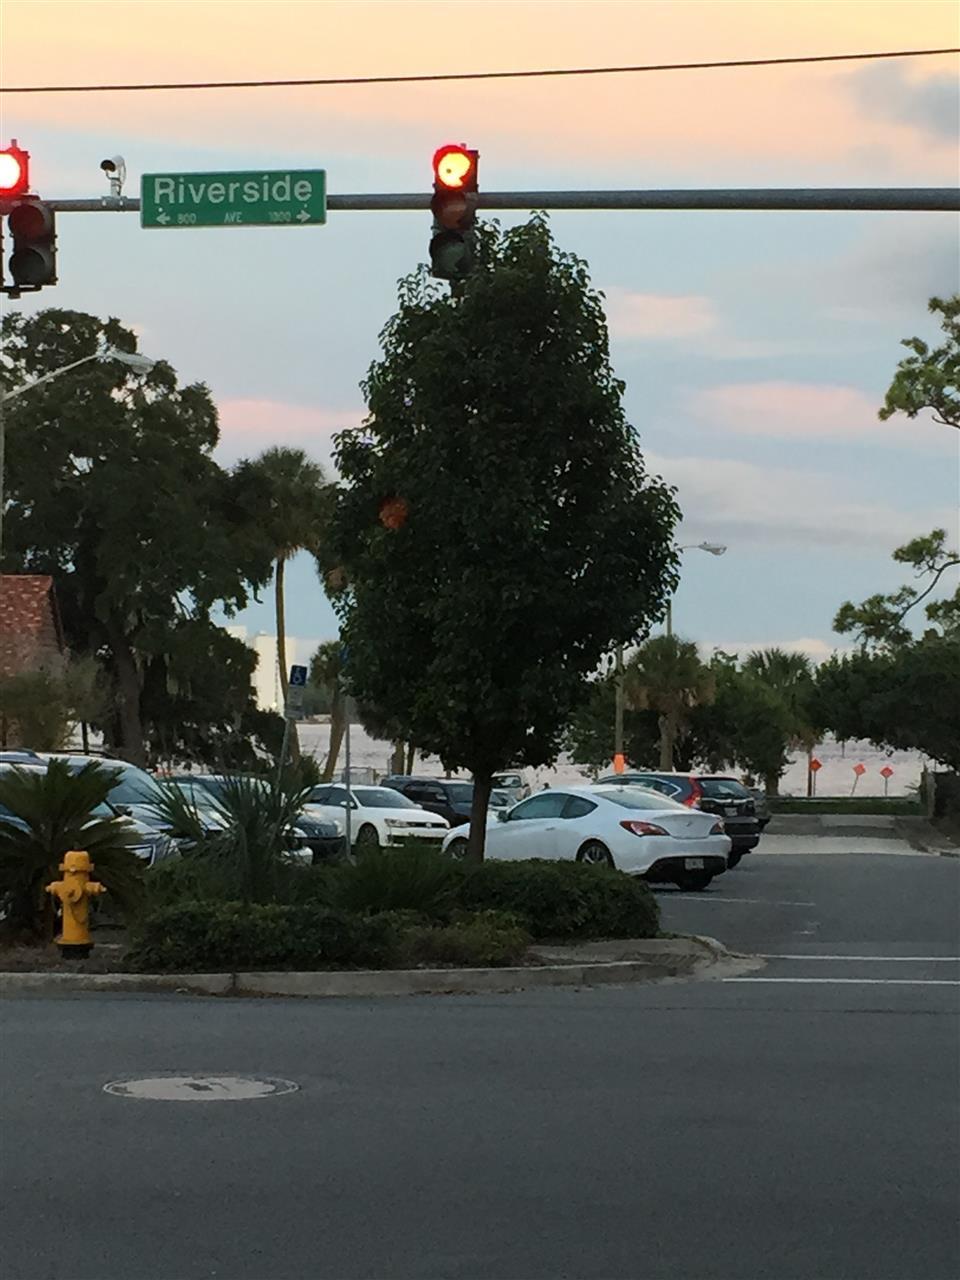 #leadingrelocal  Riverside Avenue